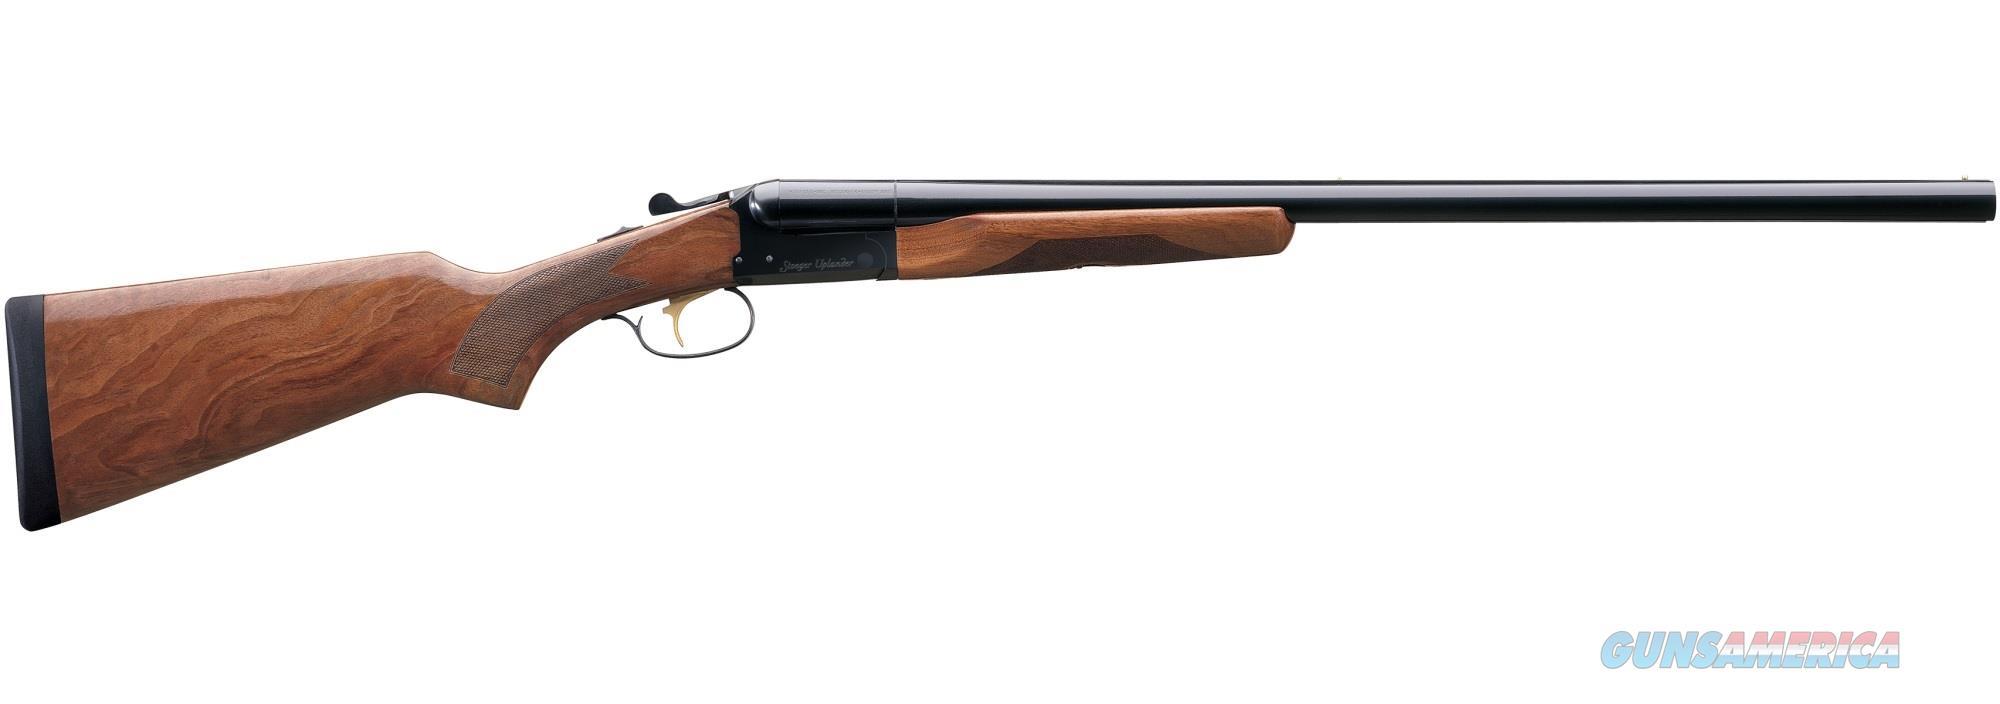 "Stoeger Uplander Supreme SxS 20 Gauge 26"" 31115   Guns > Shotguns > Stoeger Shotguns"